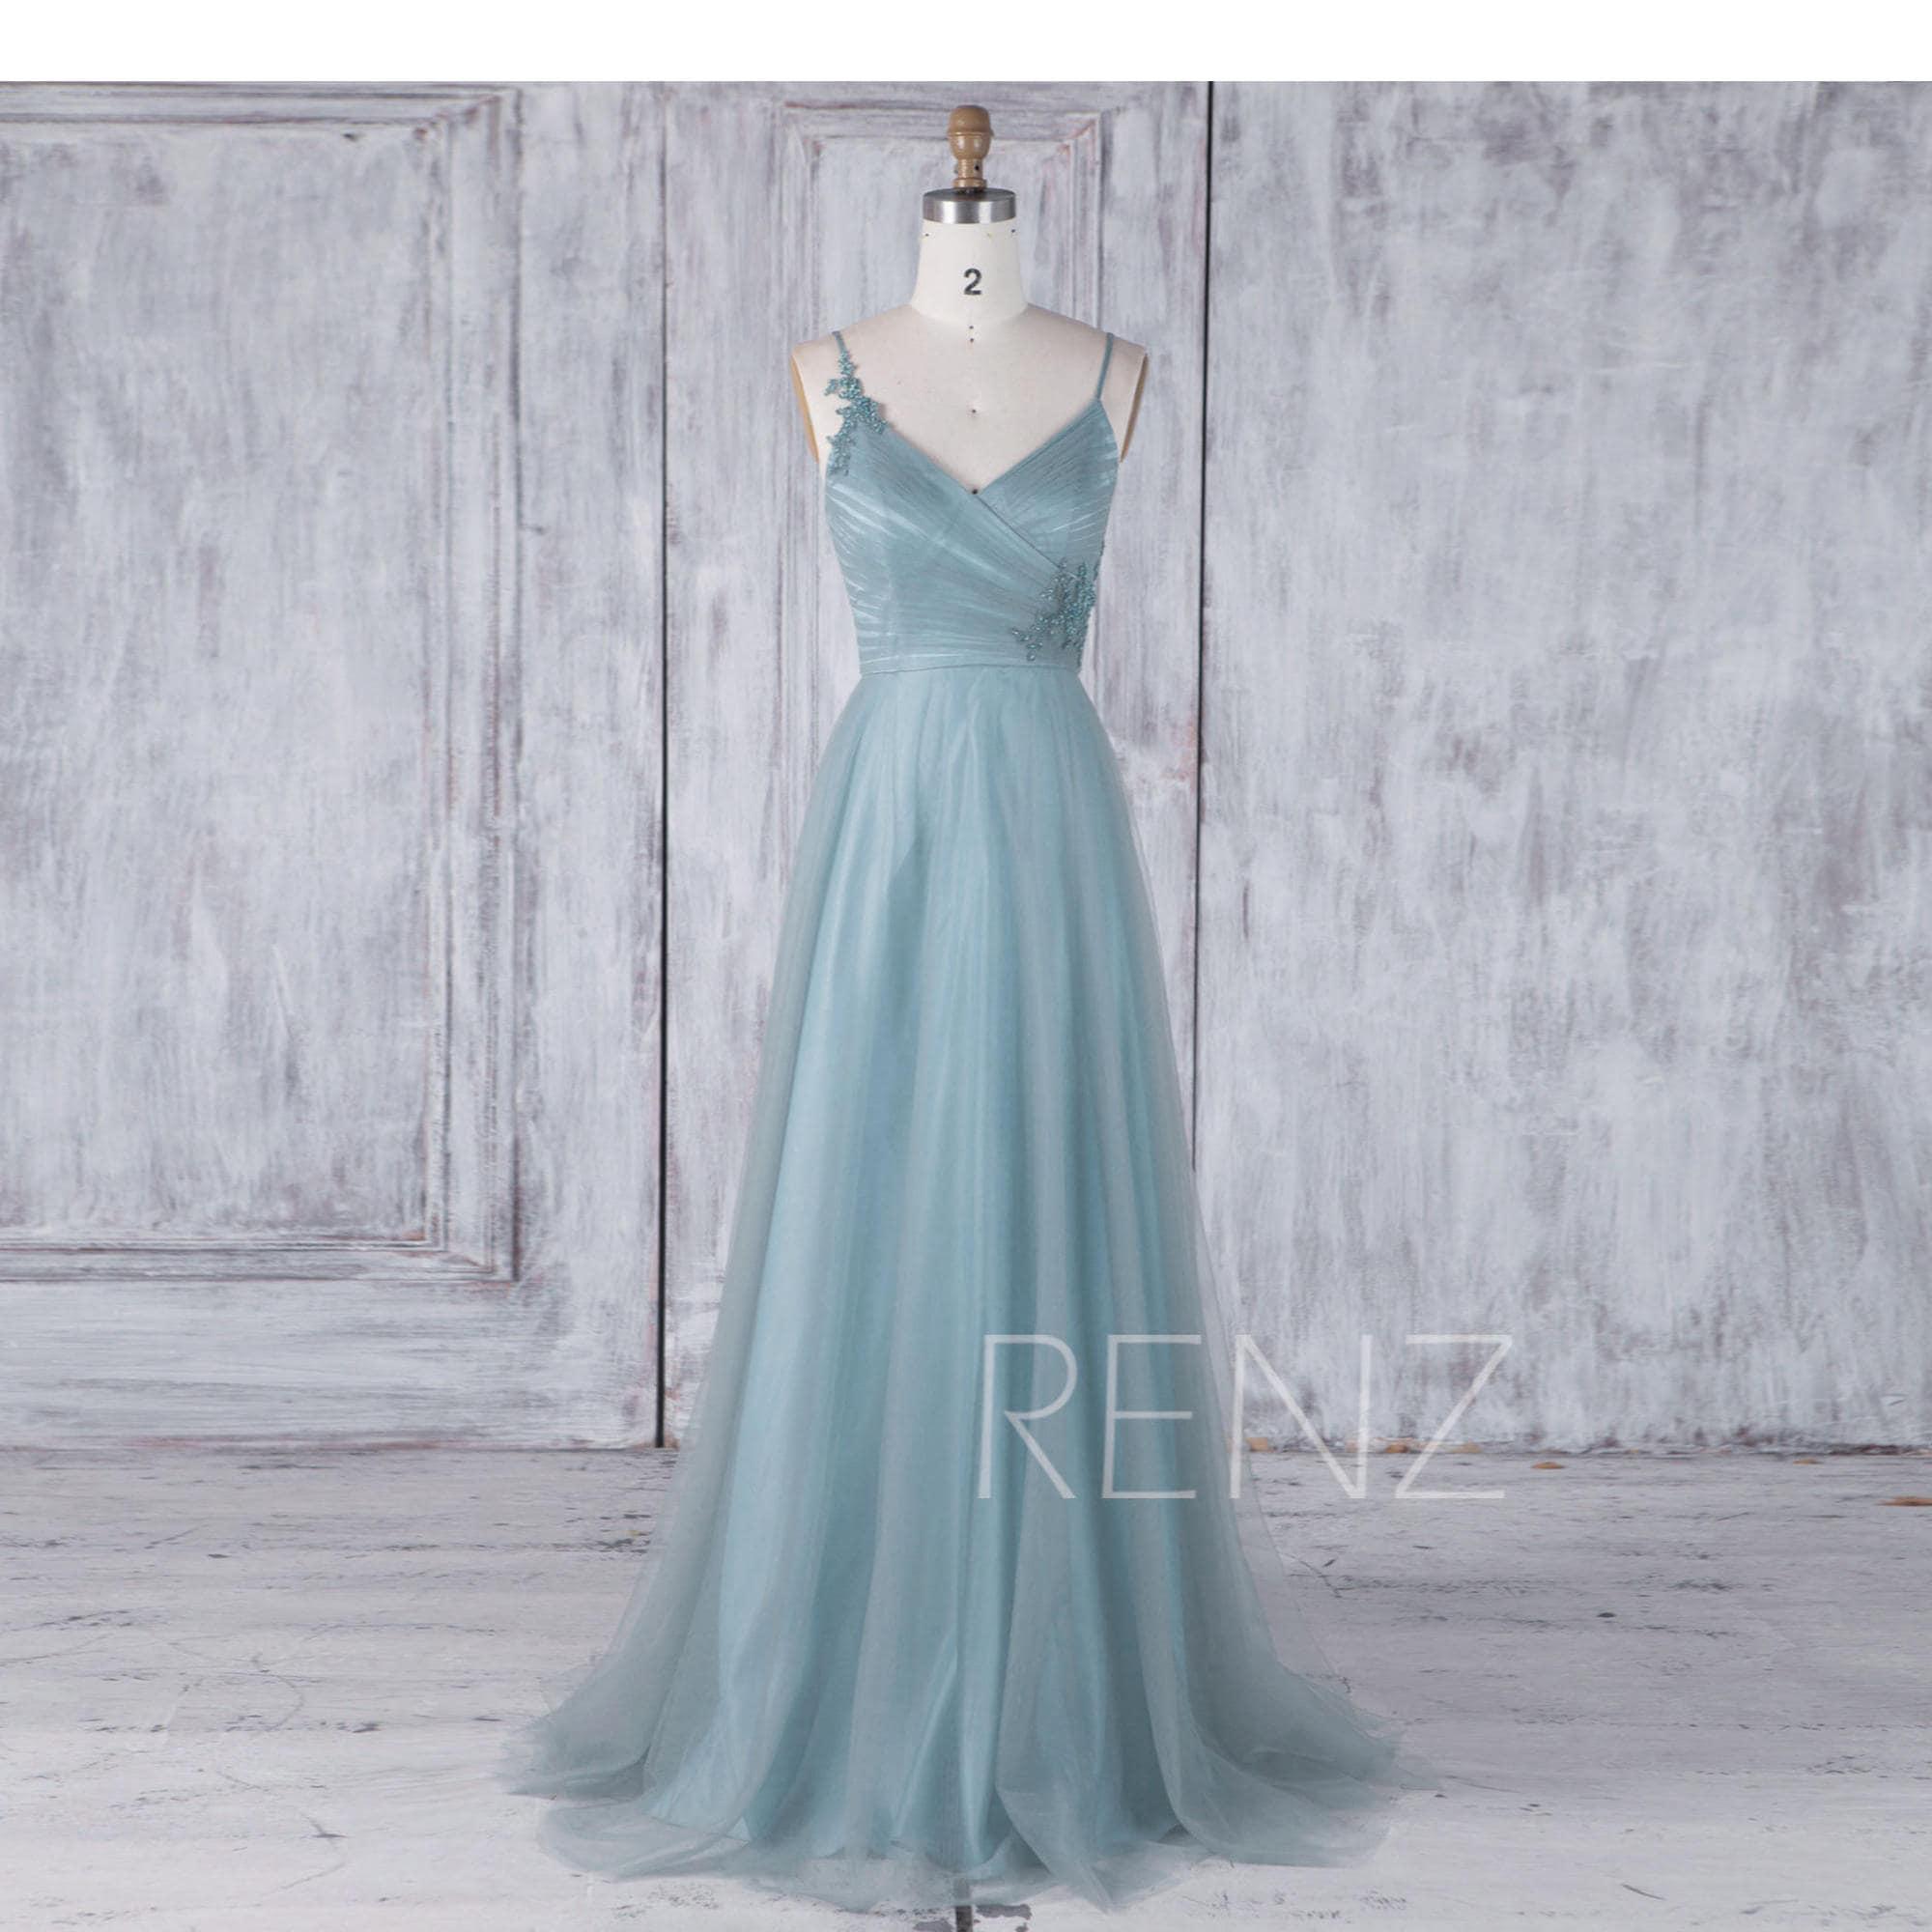 Bridesmaid Dress Dusty Blue Tulle DressSpaghetti Strap